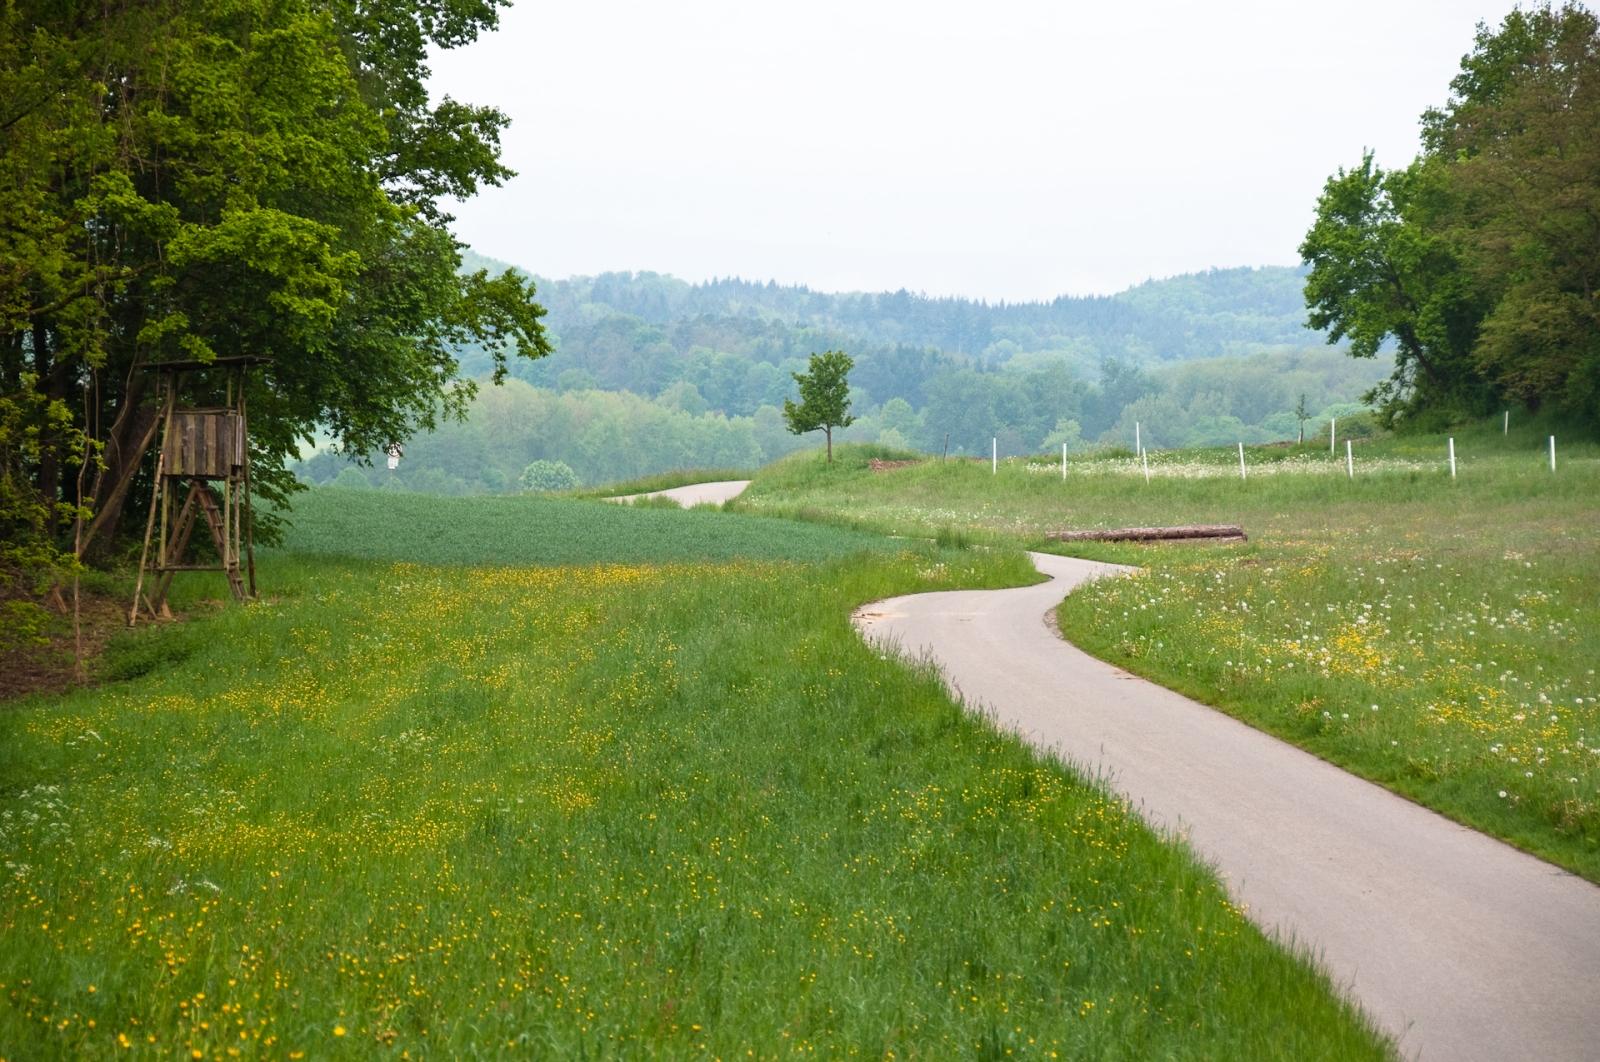 väg winding road bodensjön bodensee lake constance